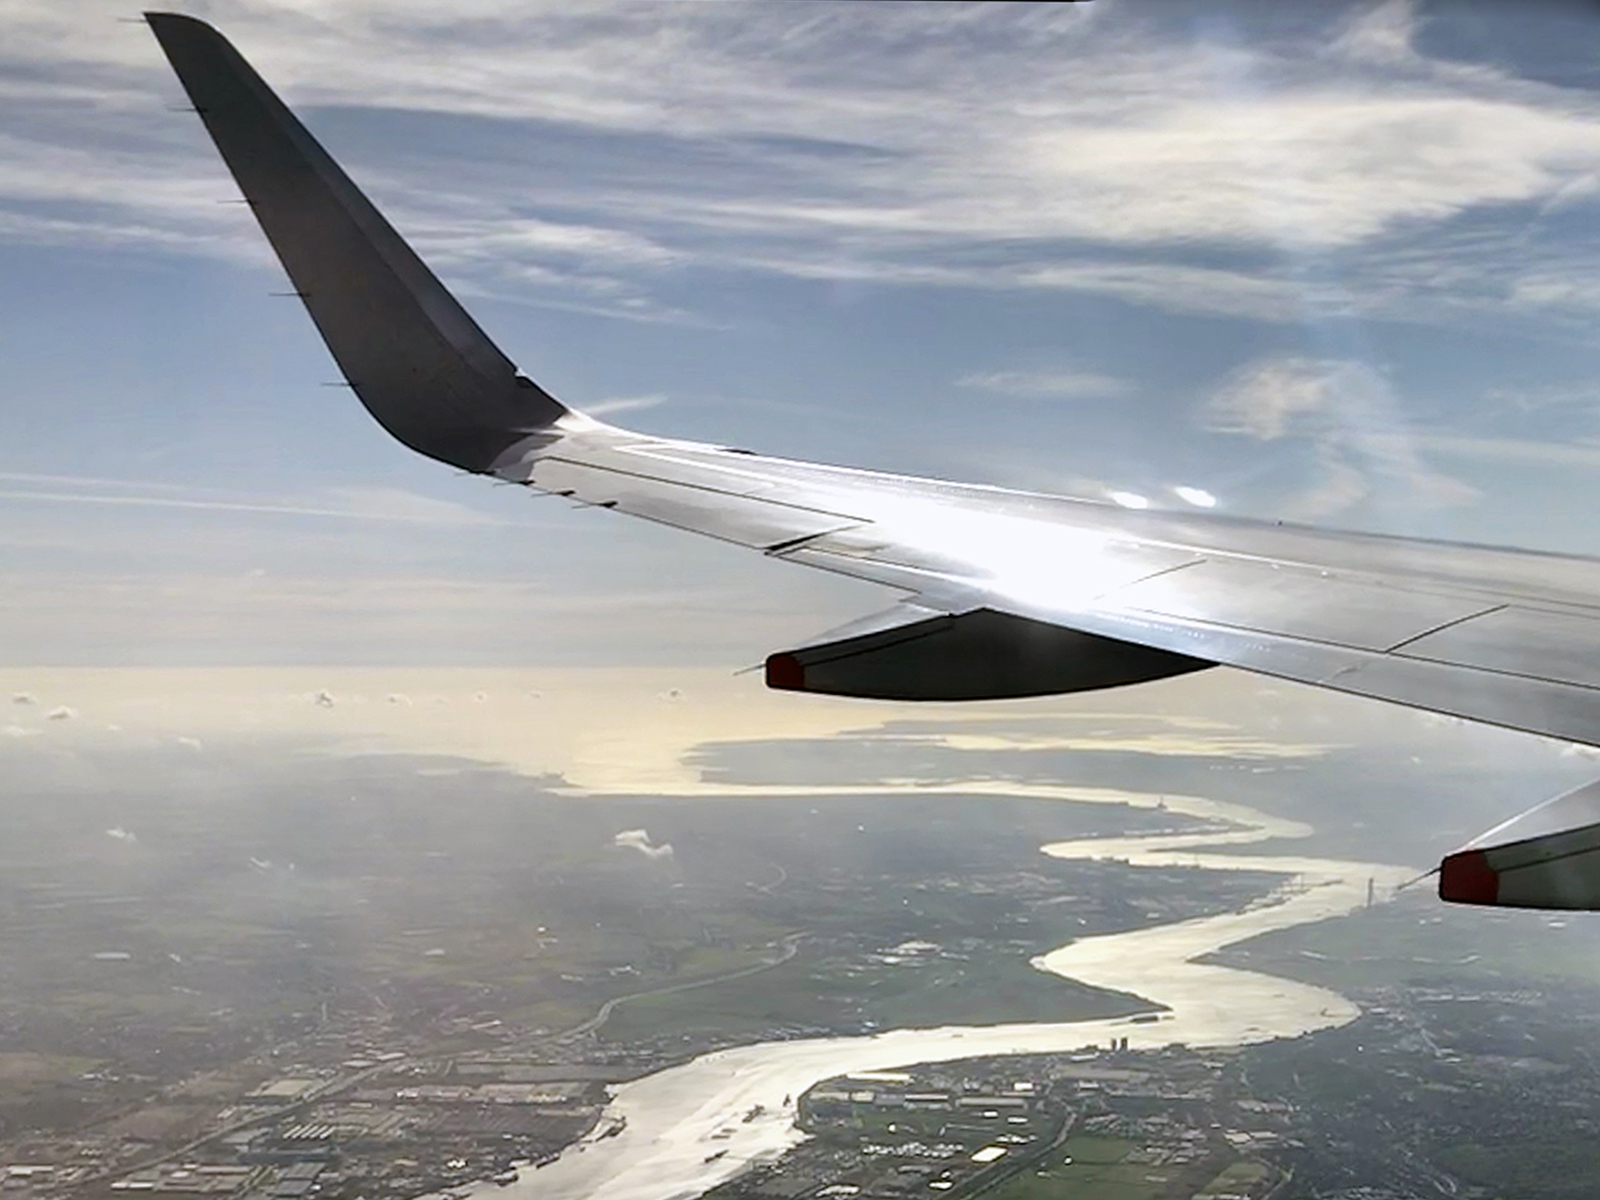 Jetlag is for amateurs: 20 Trick, damit die nächste Fernreise ohne Jetlag abläuft